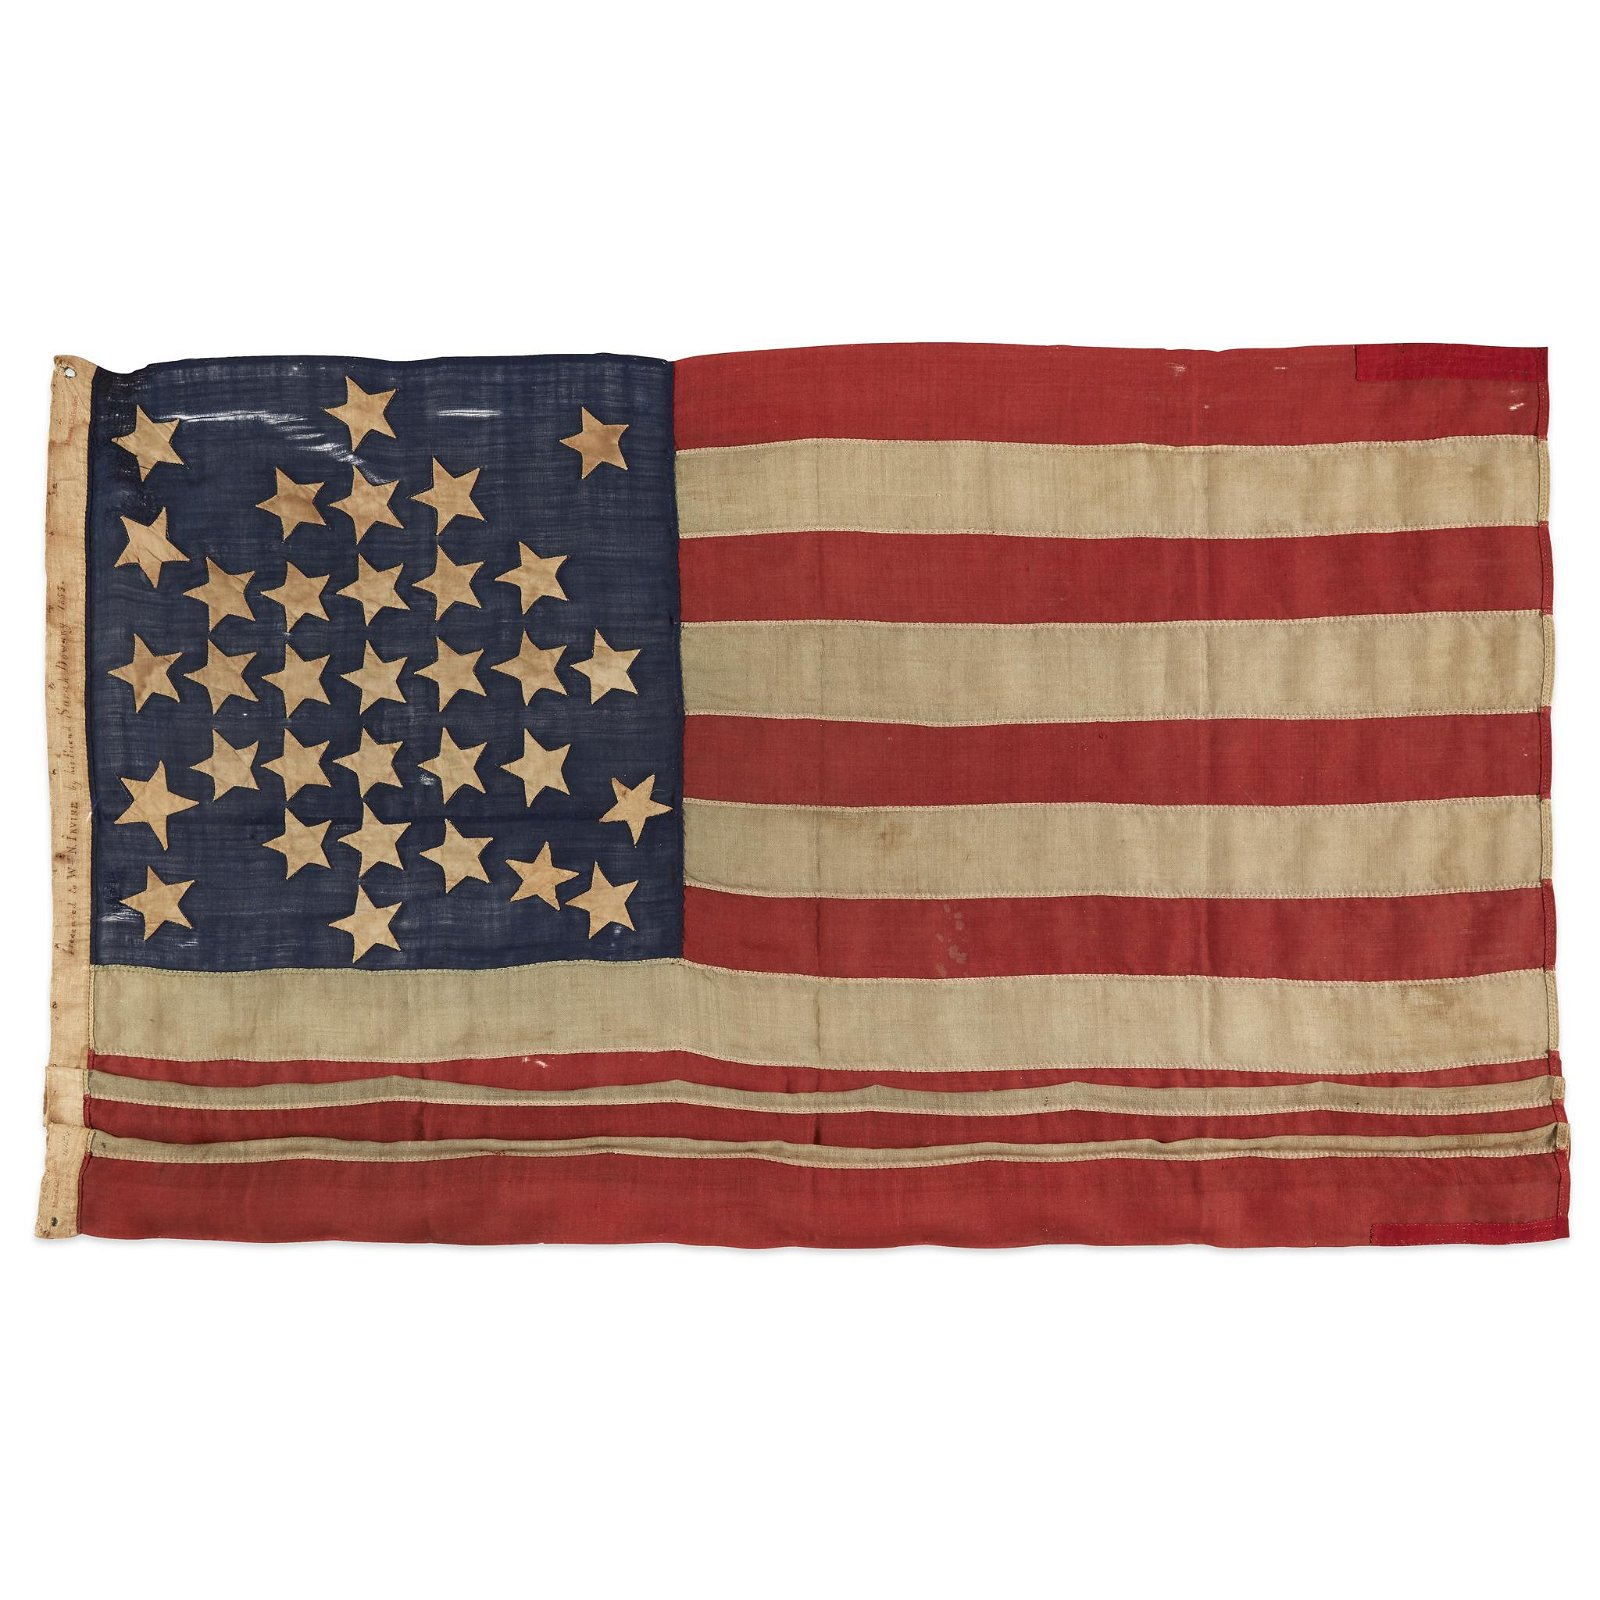 A 33-Star American Flag commemorating Oregon statehood,